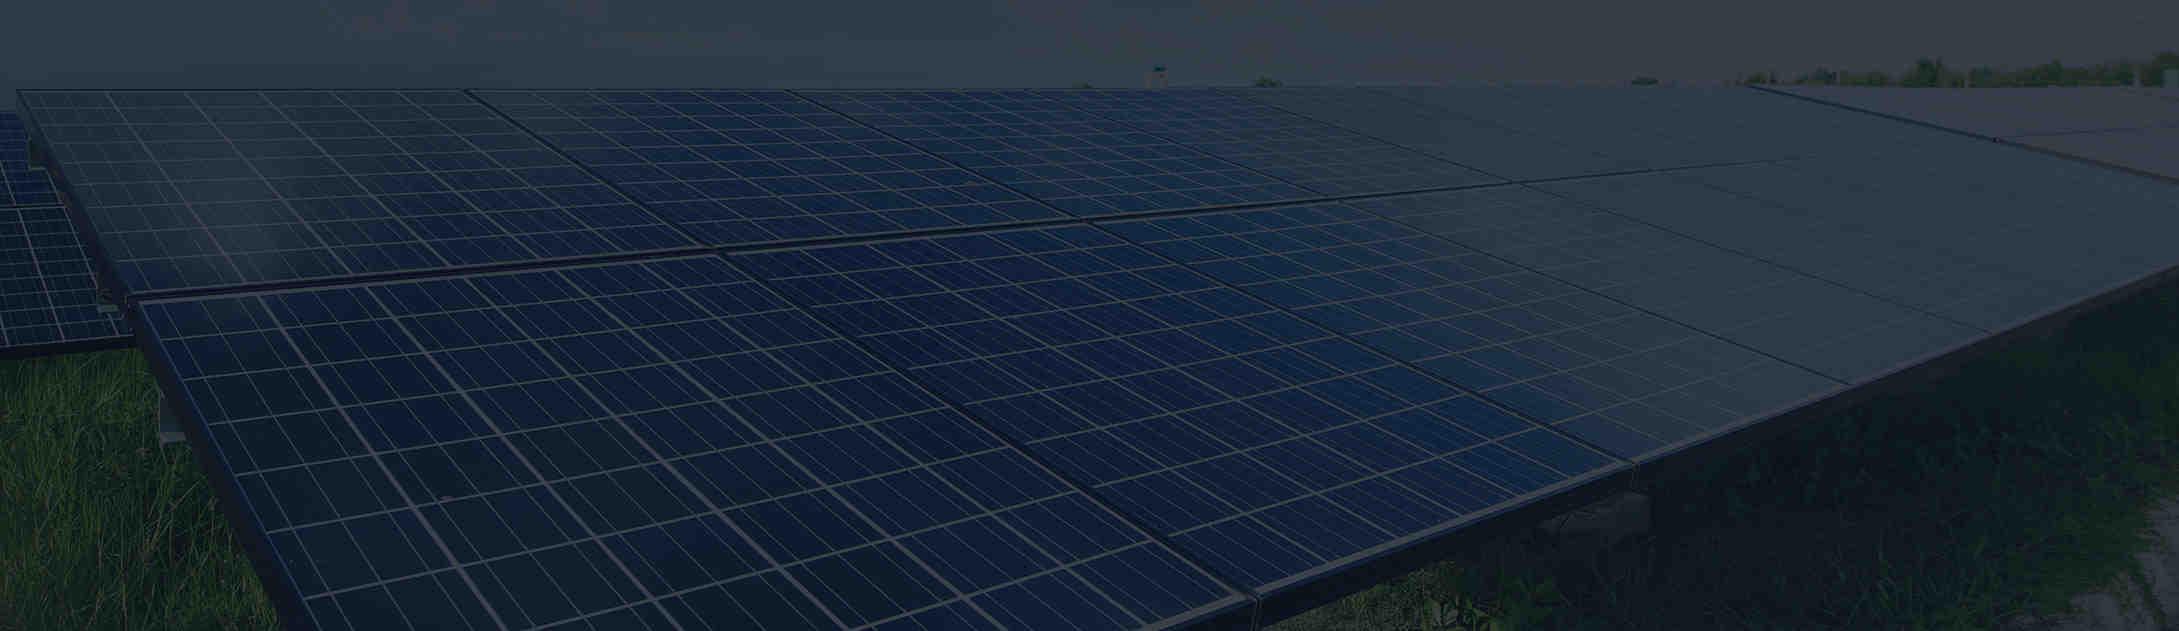 Why is Tesla solar so cheap?